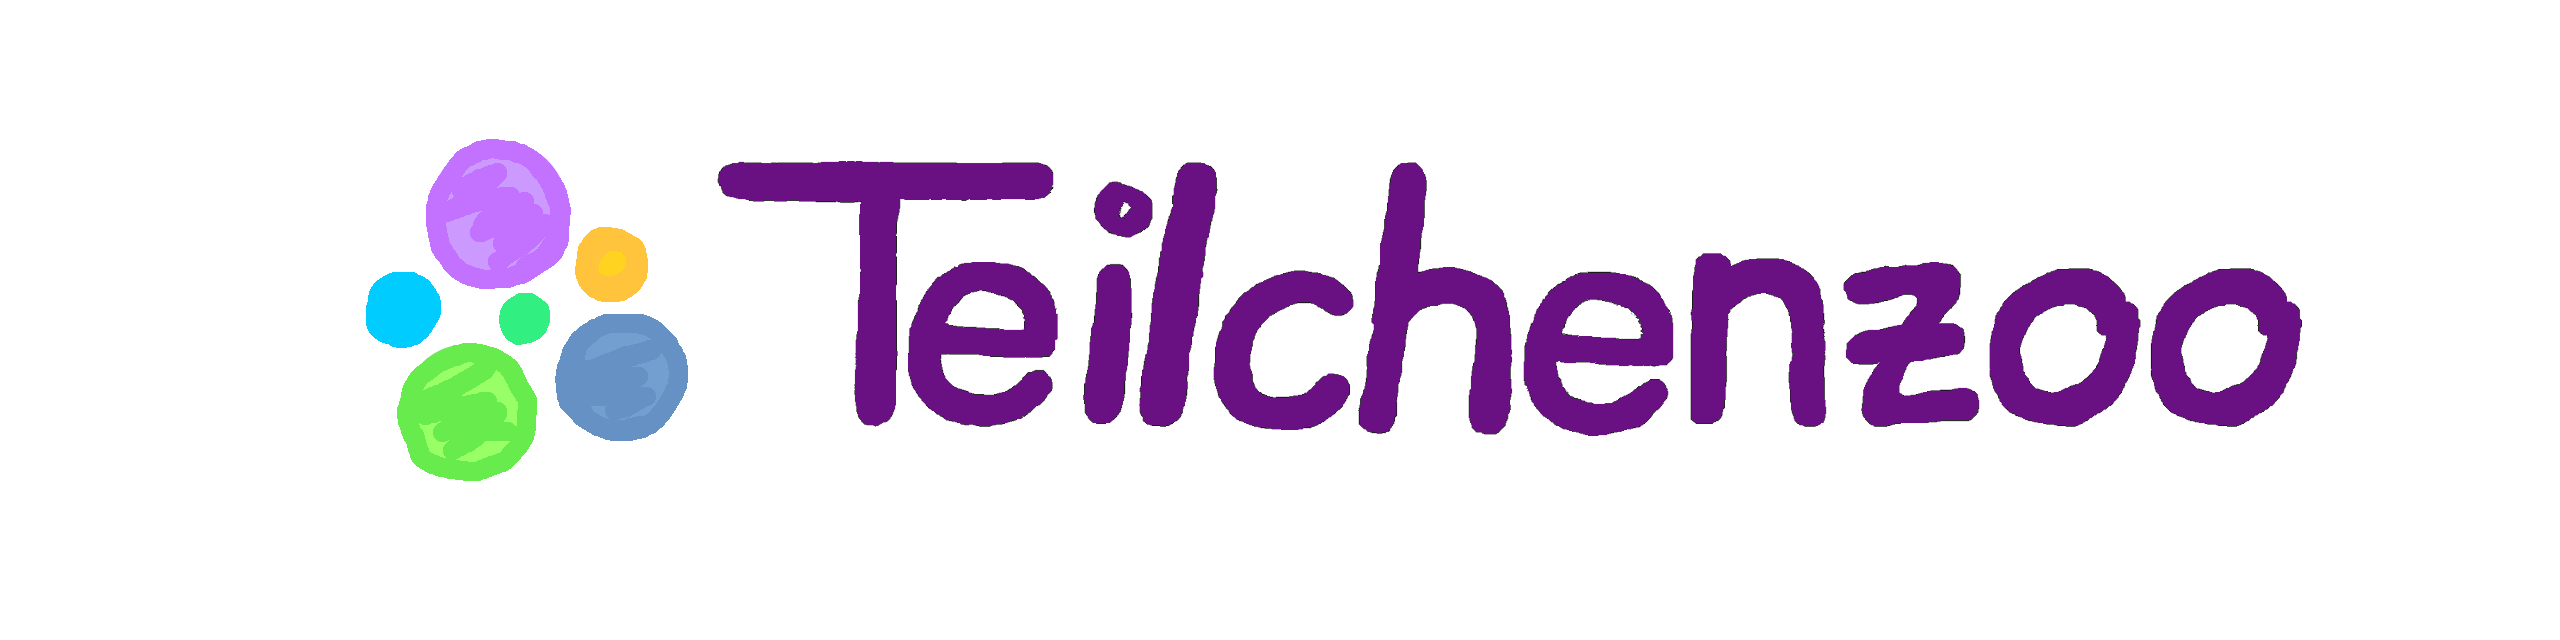 Teilchenzoo